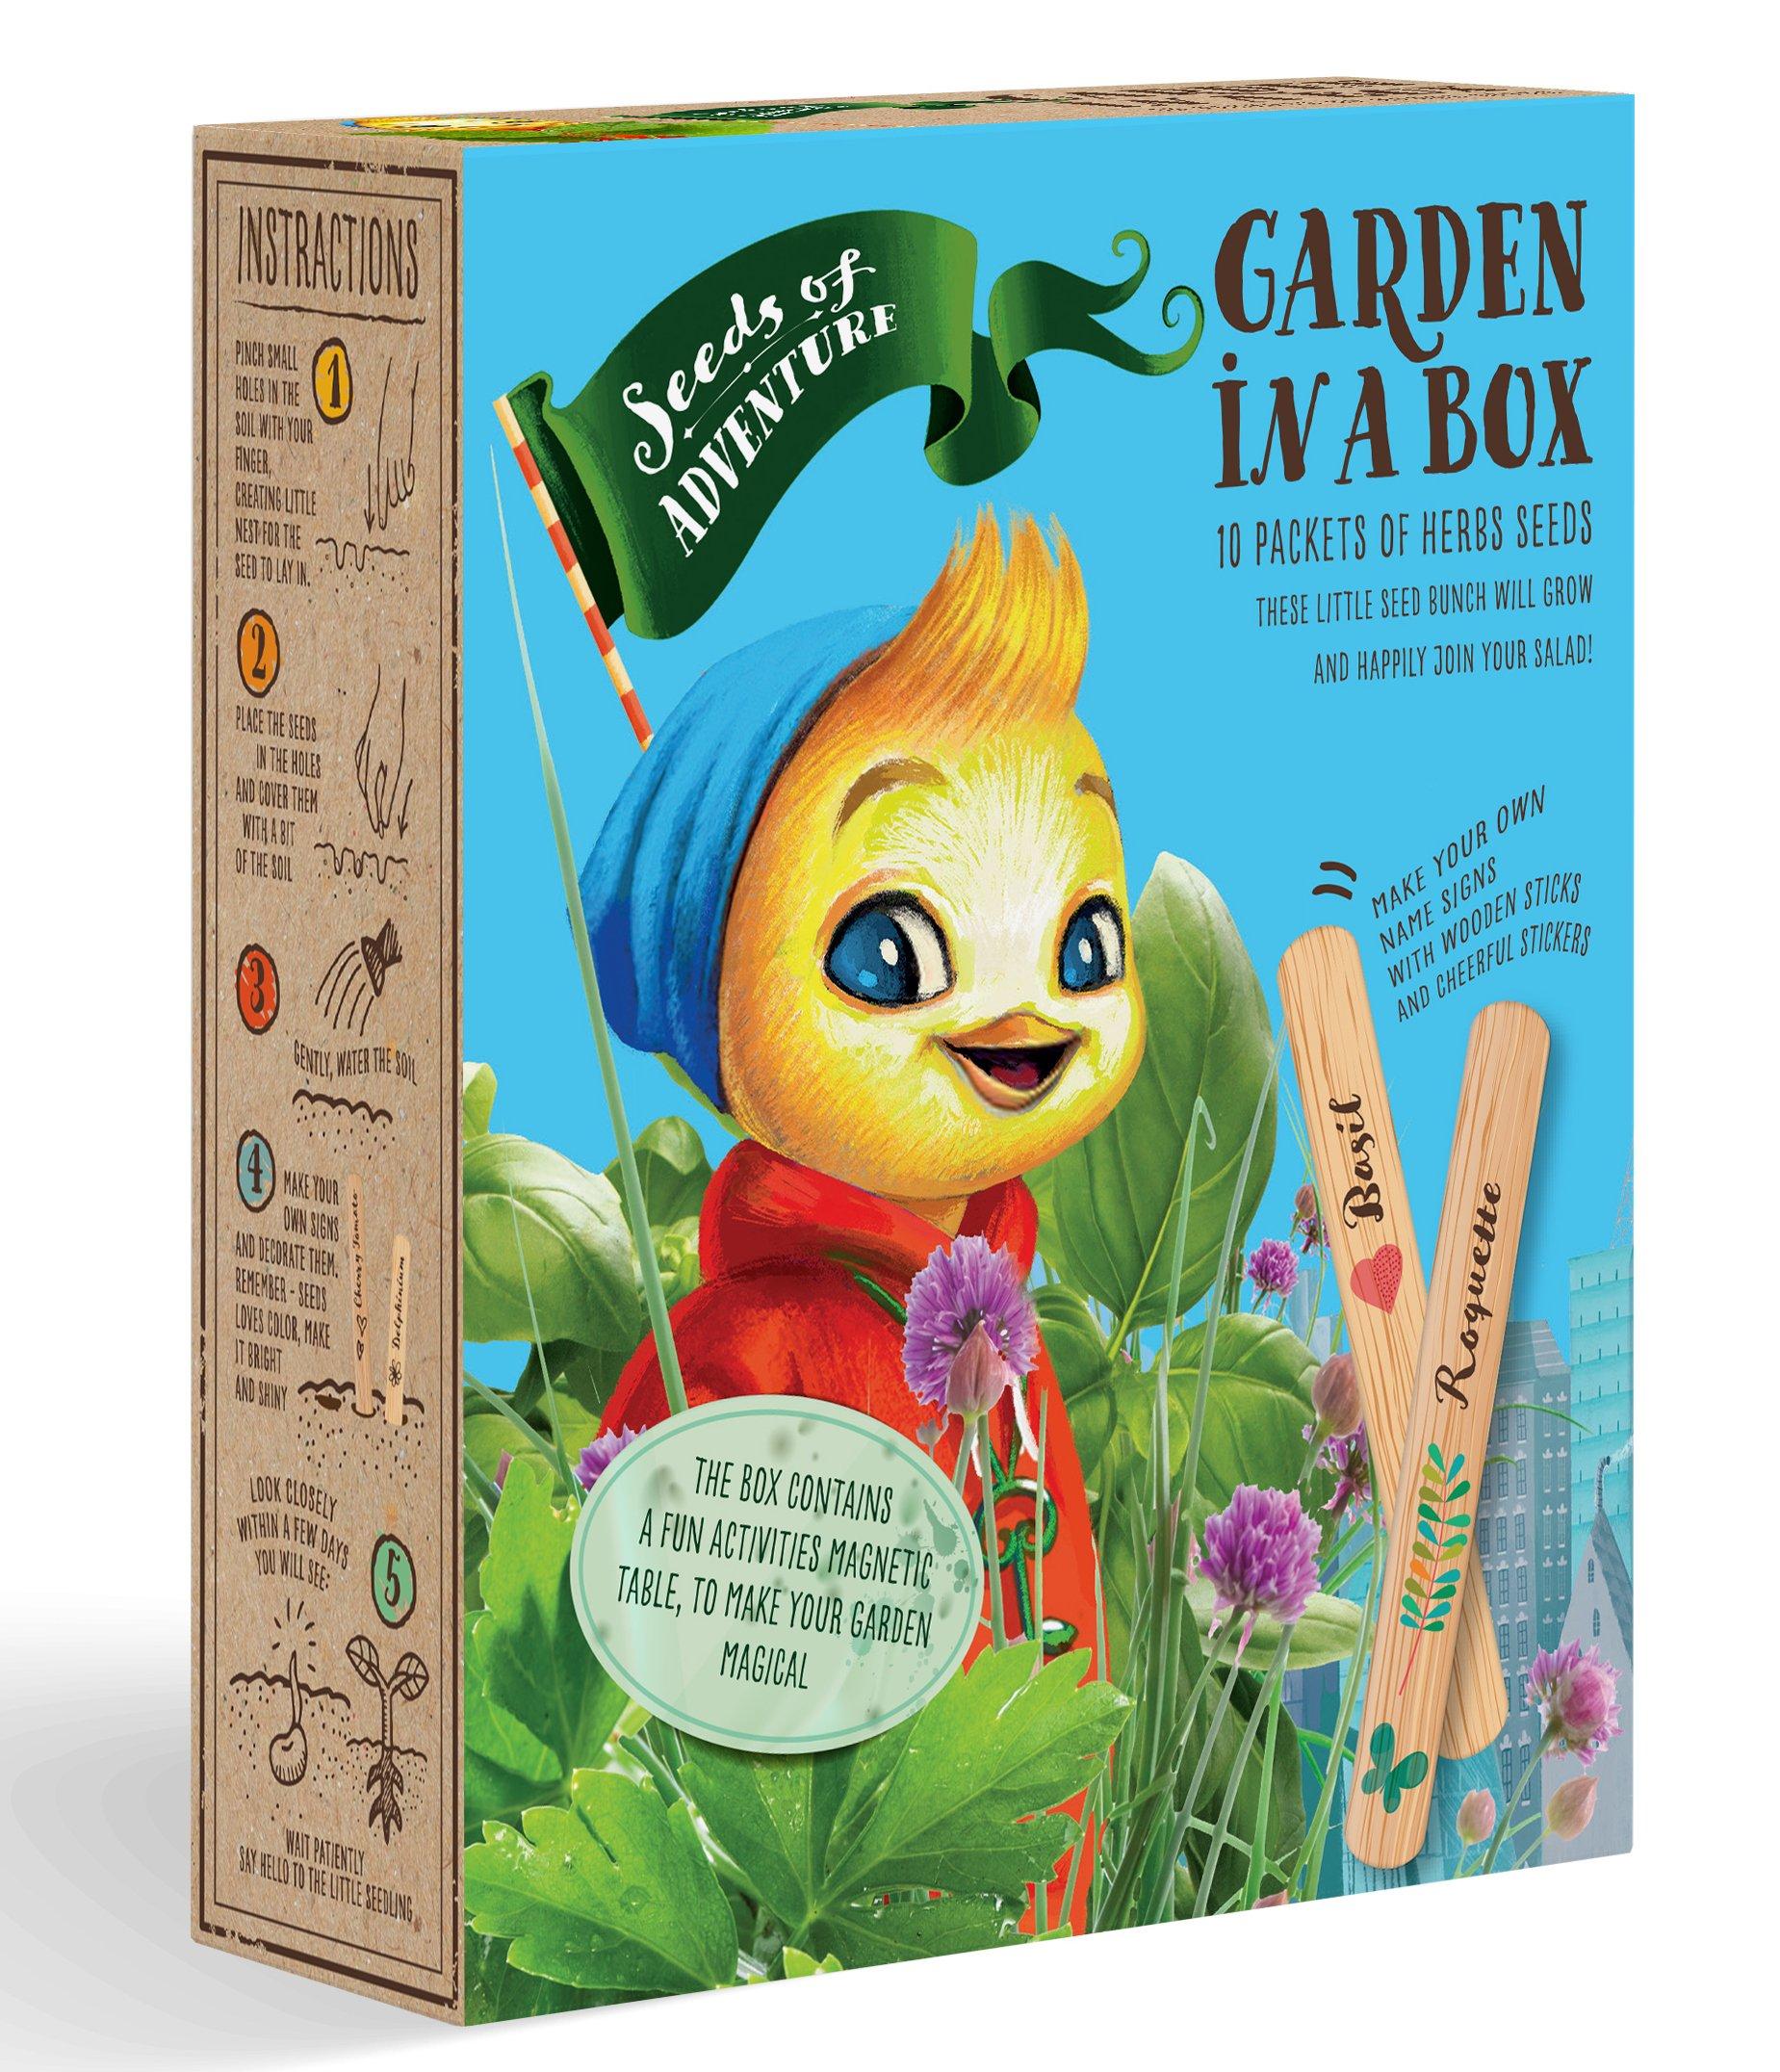 Herbs Seeds Garden In A Box (Herb Seeds Set of 10)